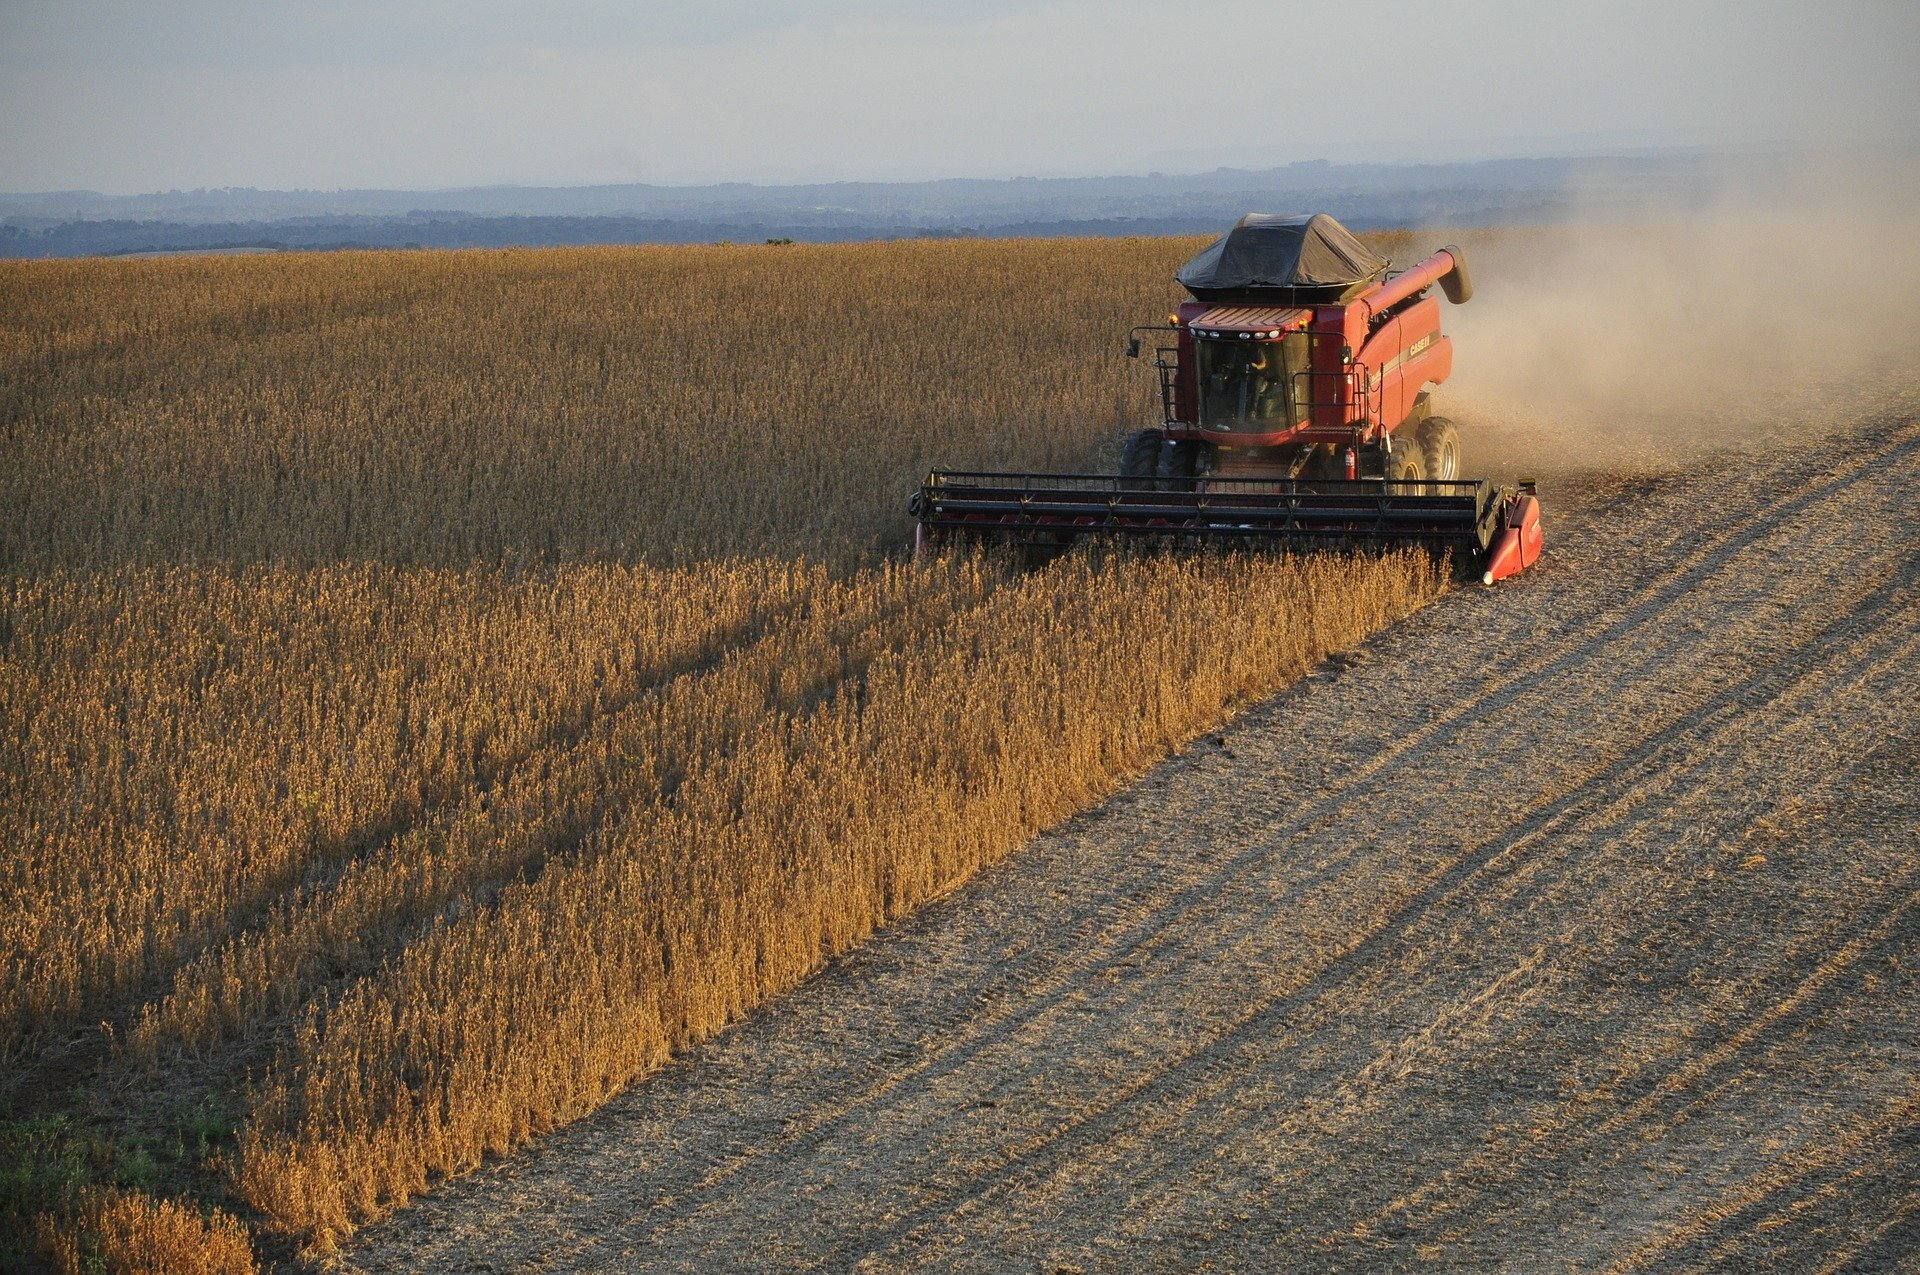 Academia Global do Agronegócio capacita gestores de toda a cadeia de valor do agronegócio